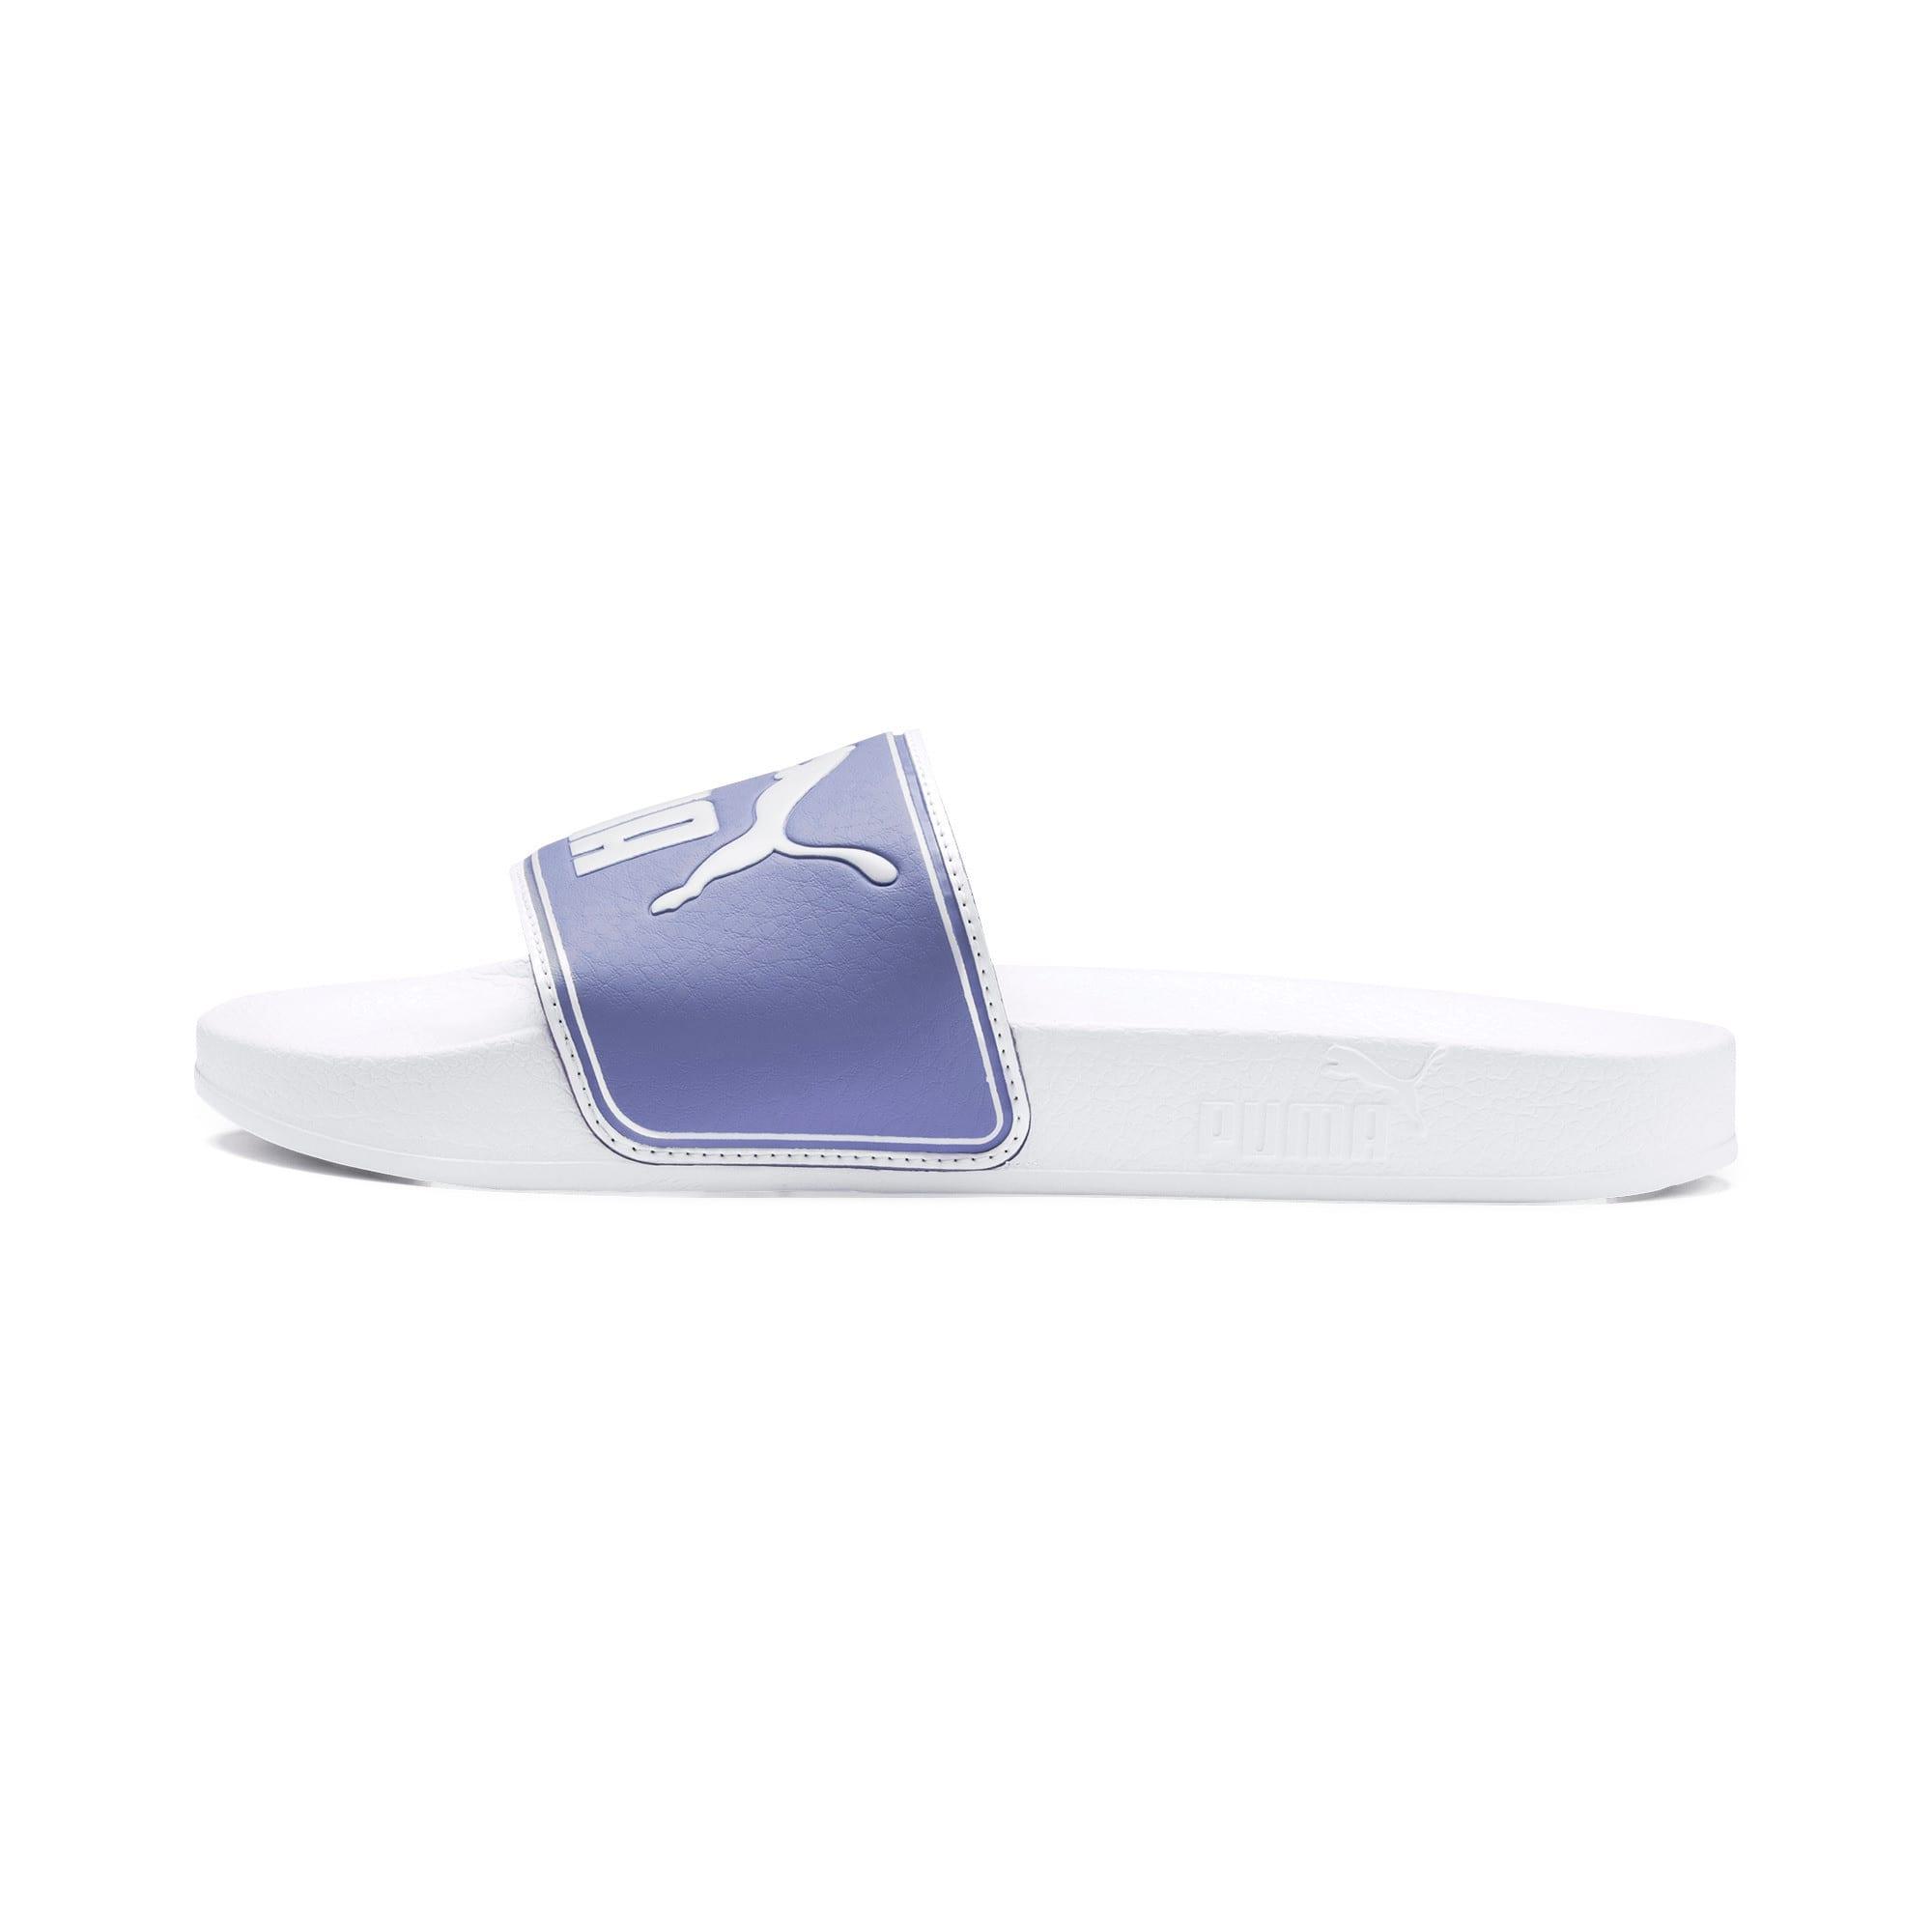 Thumbnail 1 of Leadcat Sandals, Puma White-Sweet Lavender, medium